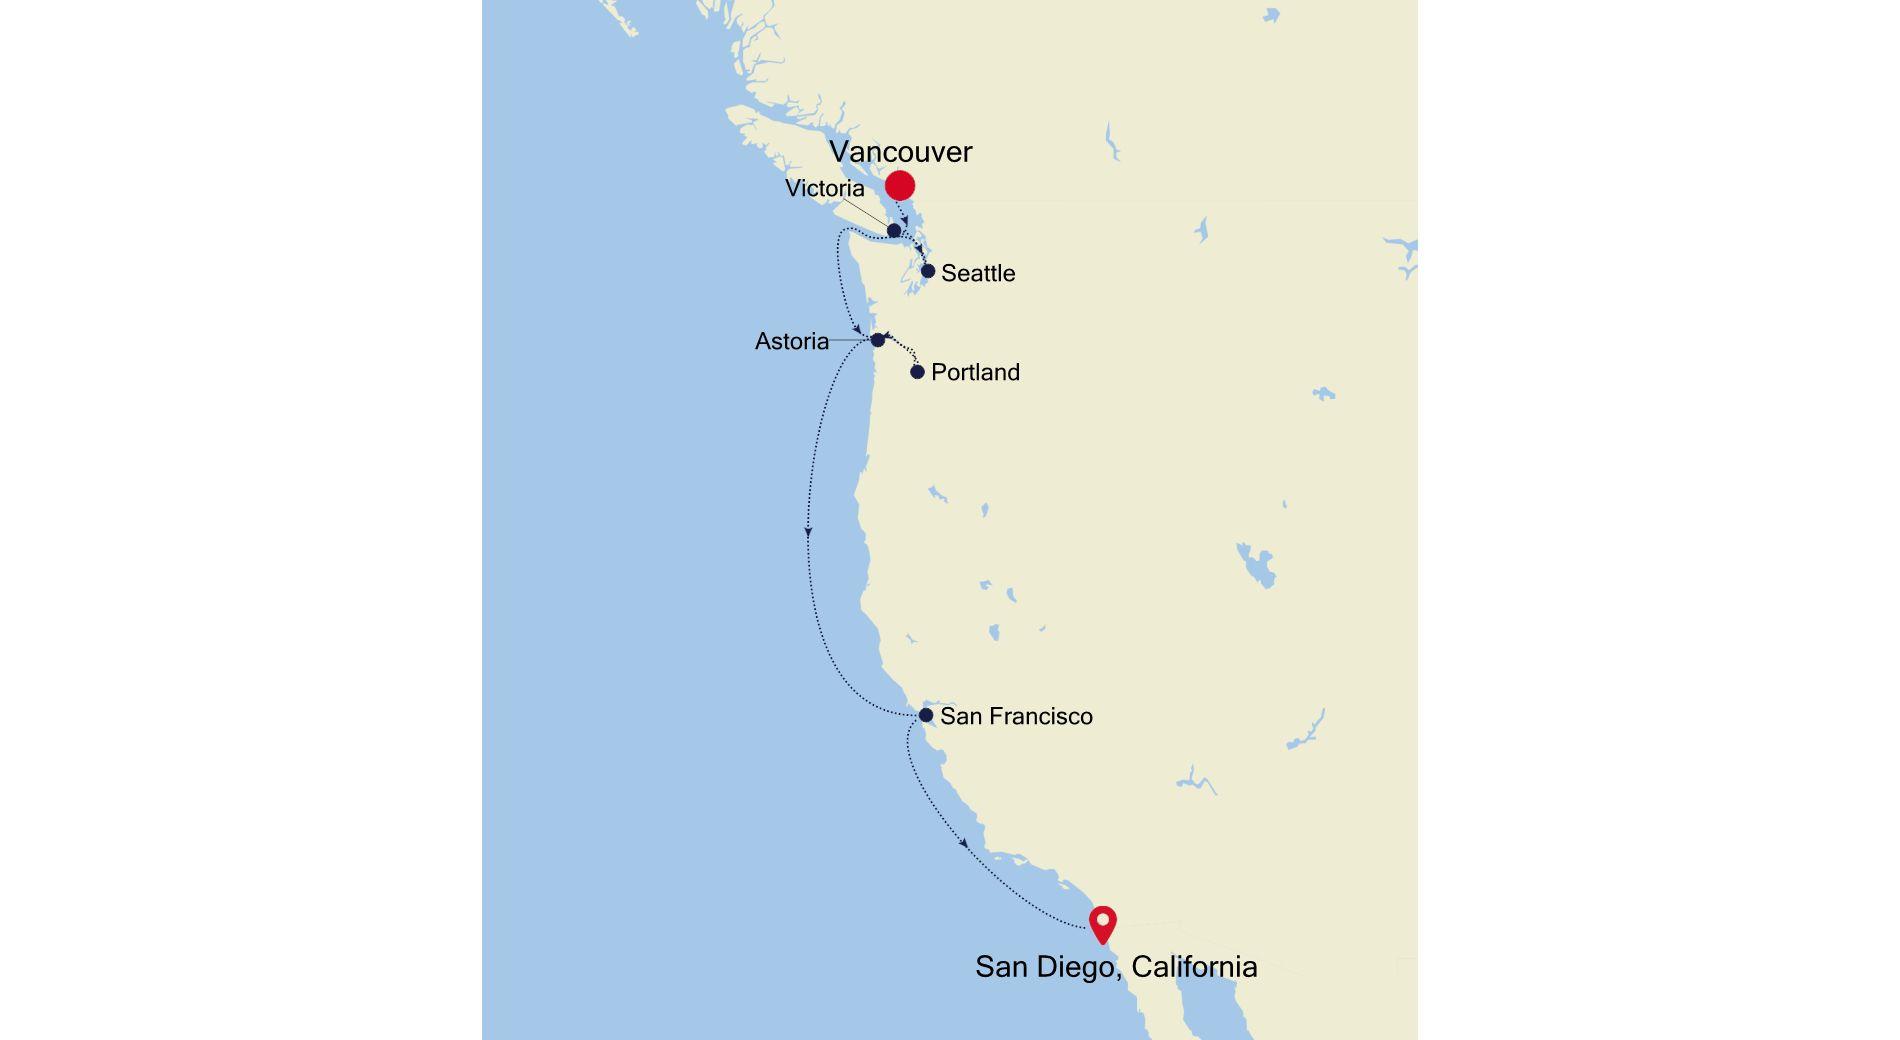 E4211001009 - Vancouver à San Diego